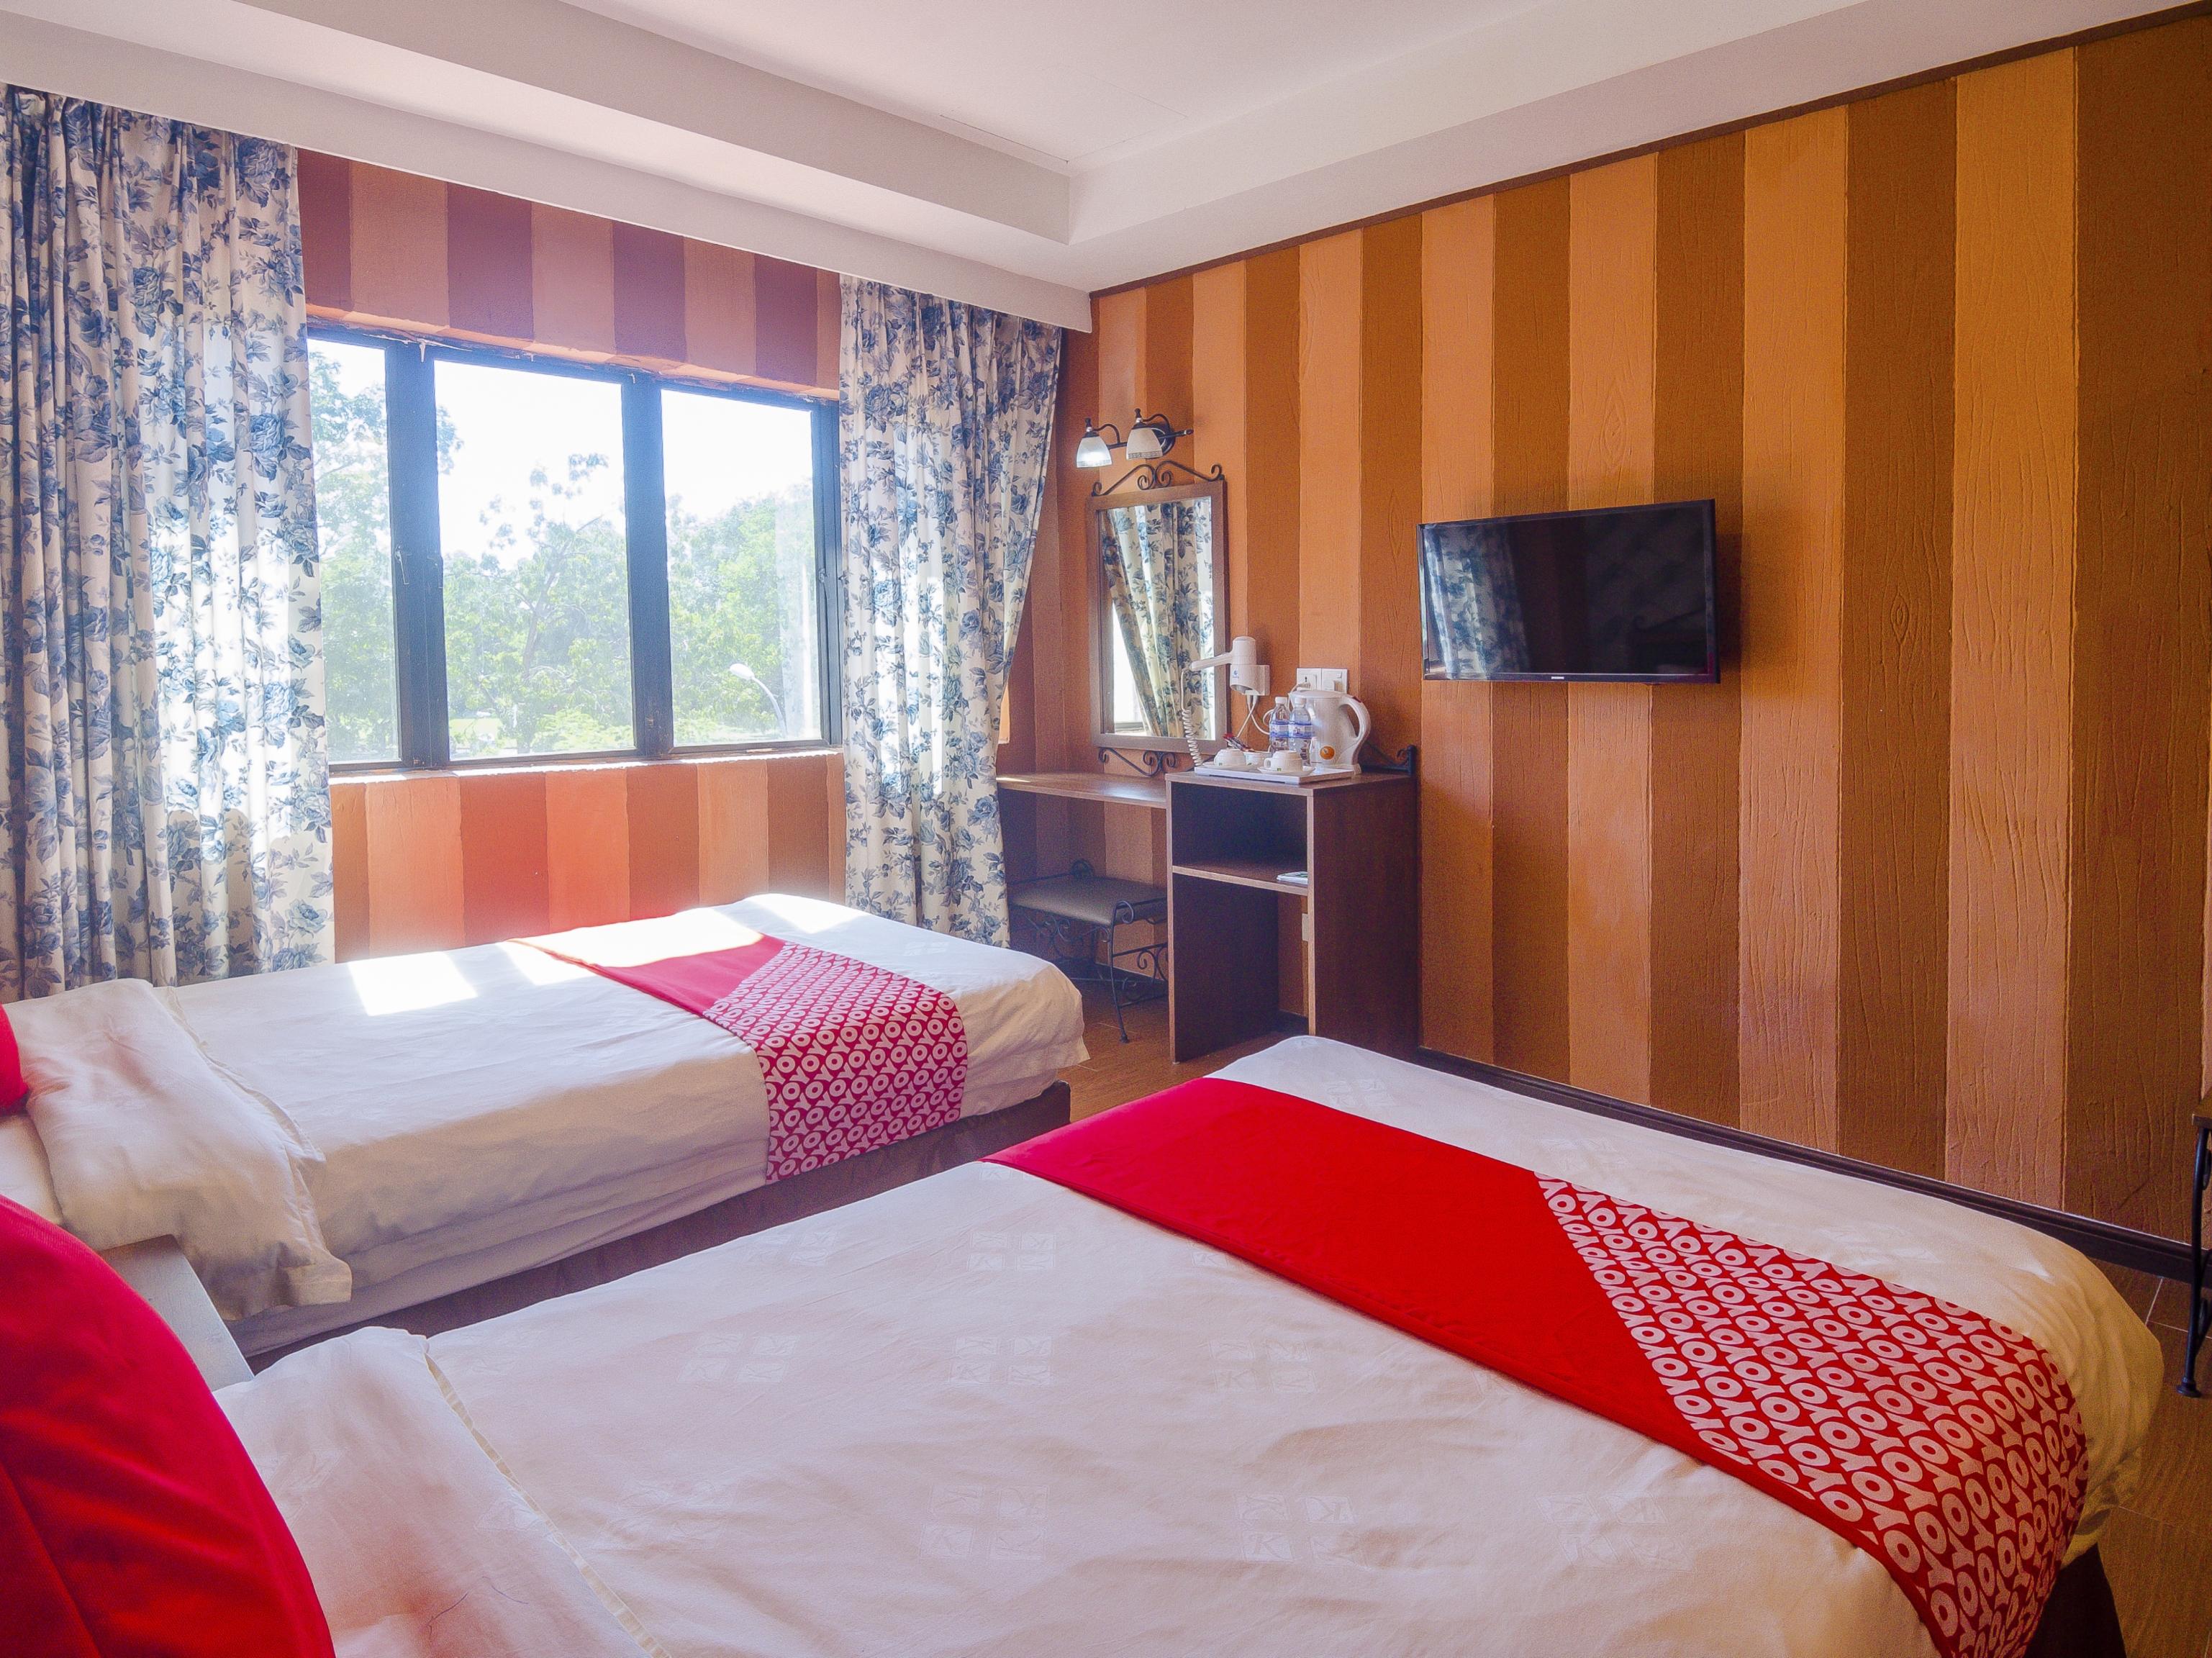 K Garden Hotel, Kuala Muda